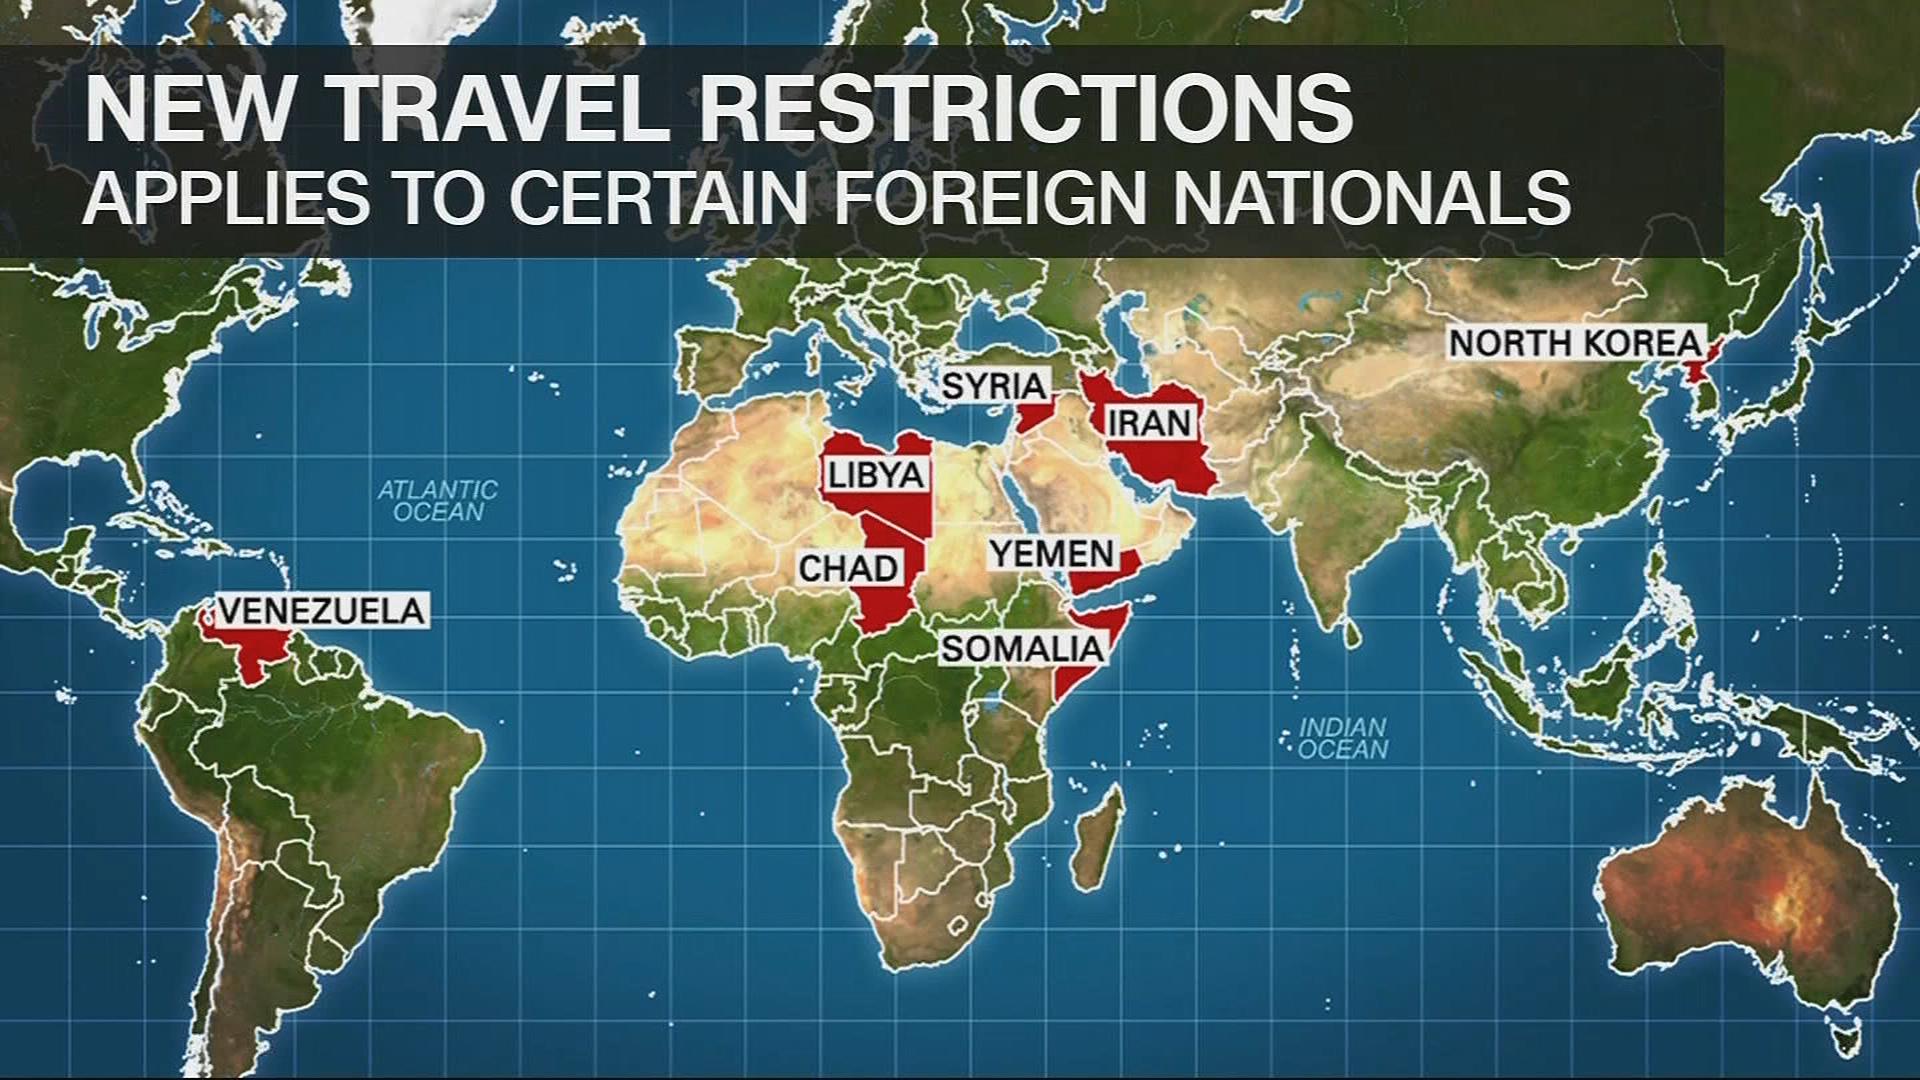 North Korea Venezuela On New Trump Travel Restrictions